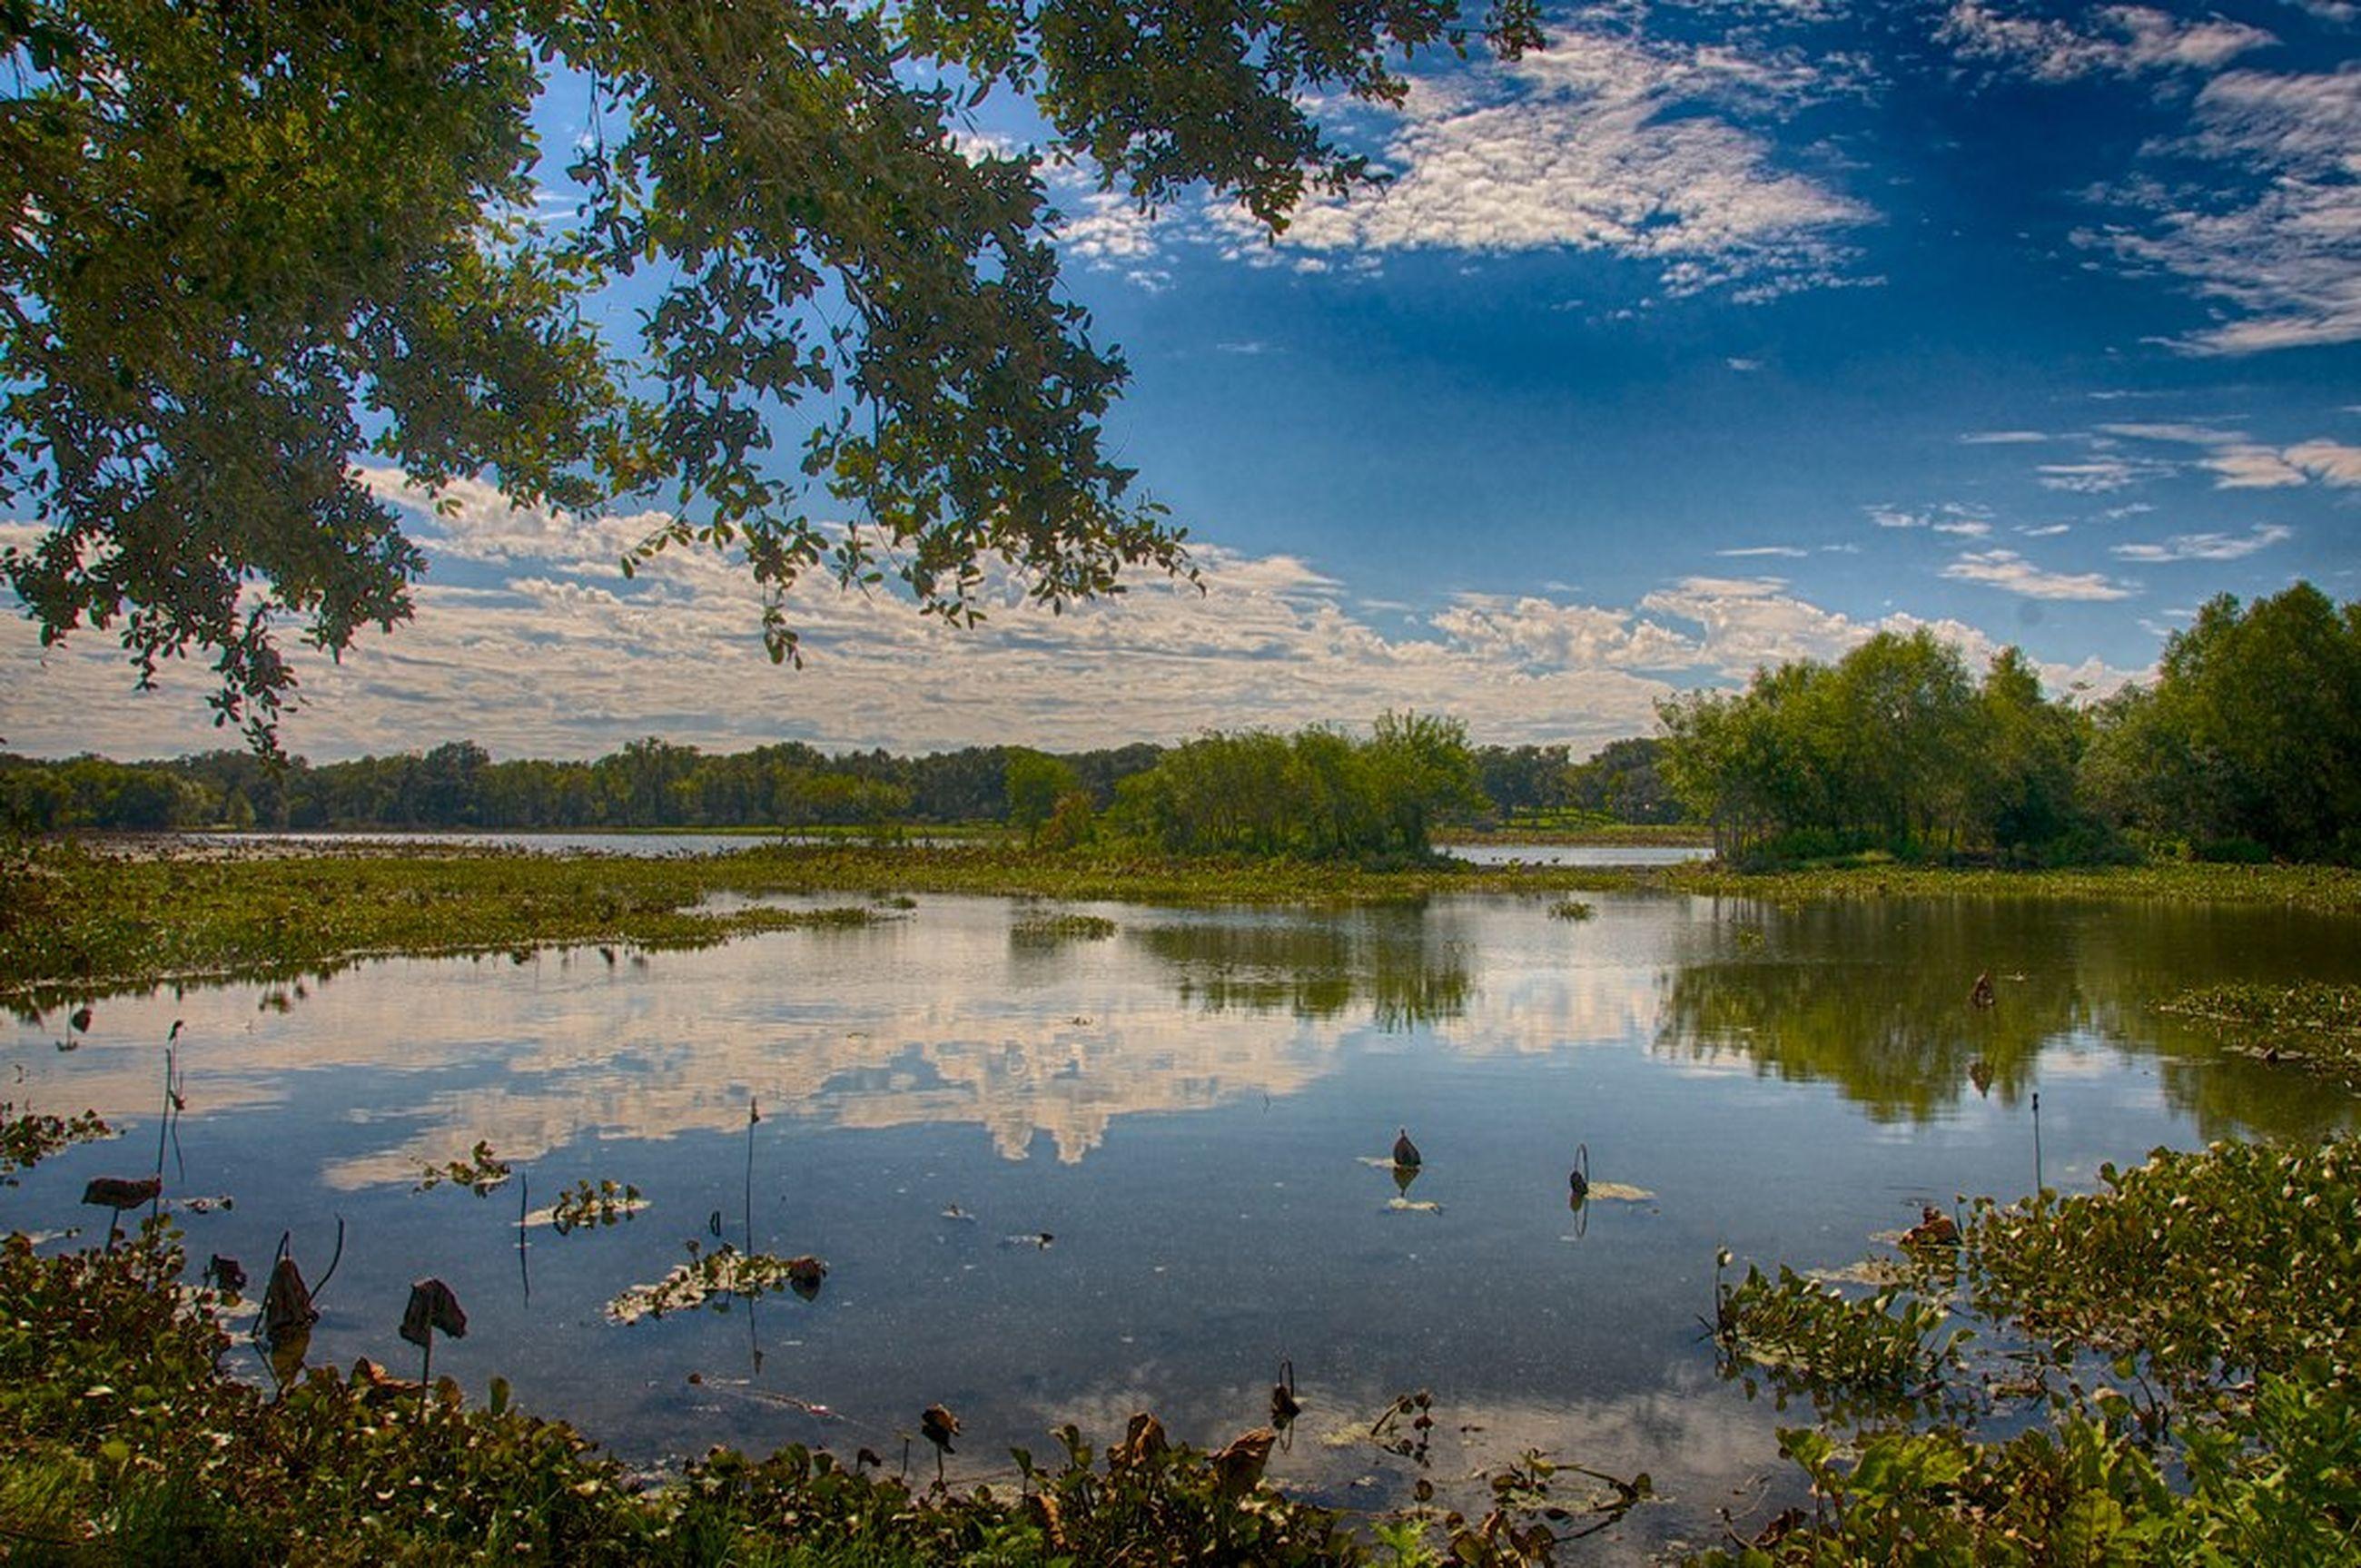 water, lake, bird, reflection, tree, animal themes, animals in the wild, wildlife, tranquility, tranquil scene, swimming, duck, nature, beauty in nature, sky, scenics, grass, lakeshore, swan, water bird